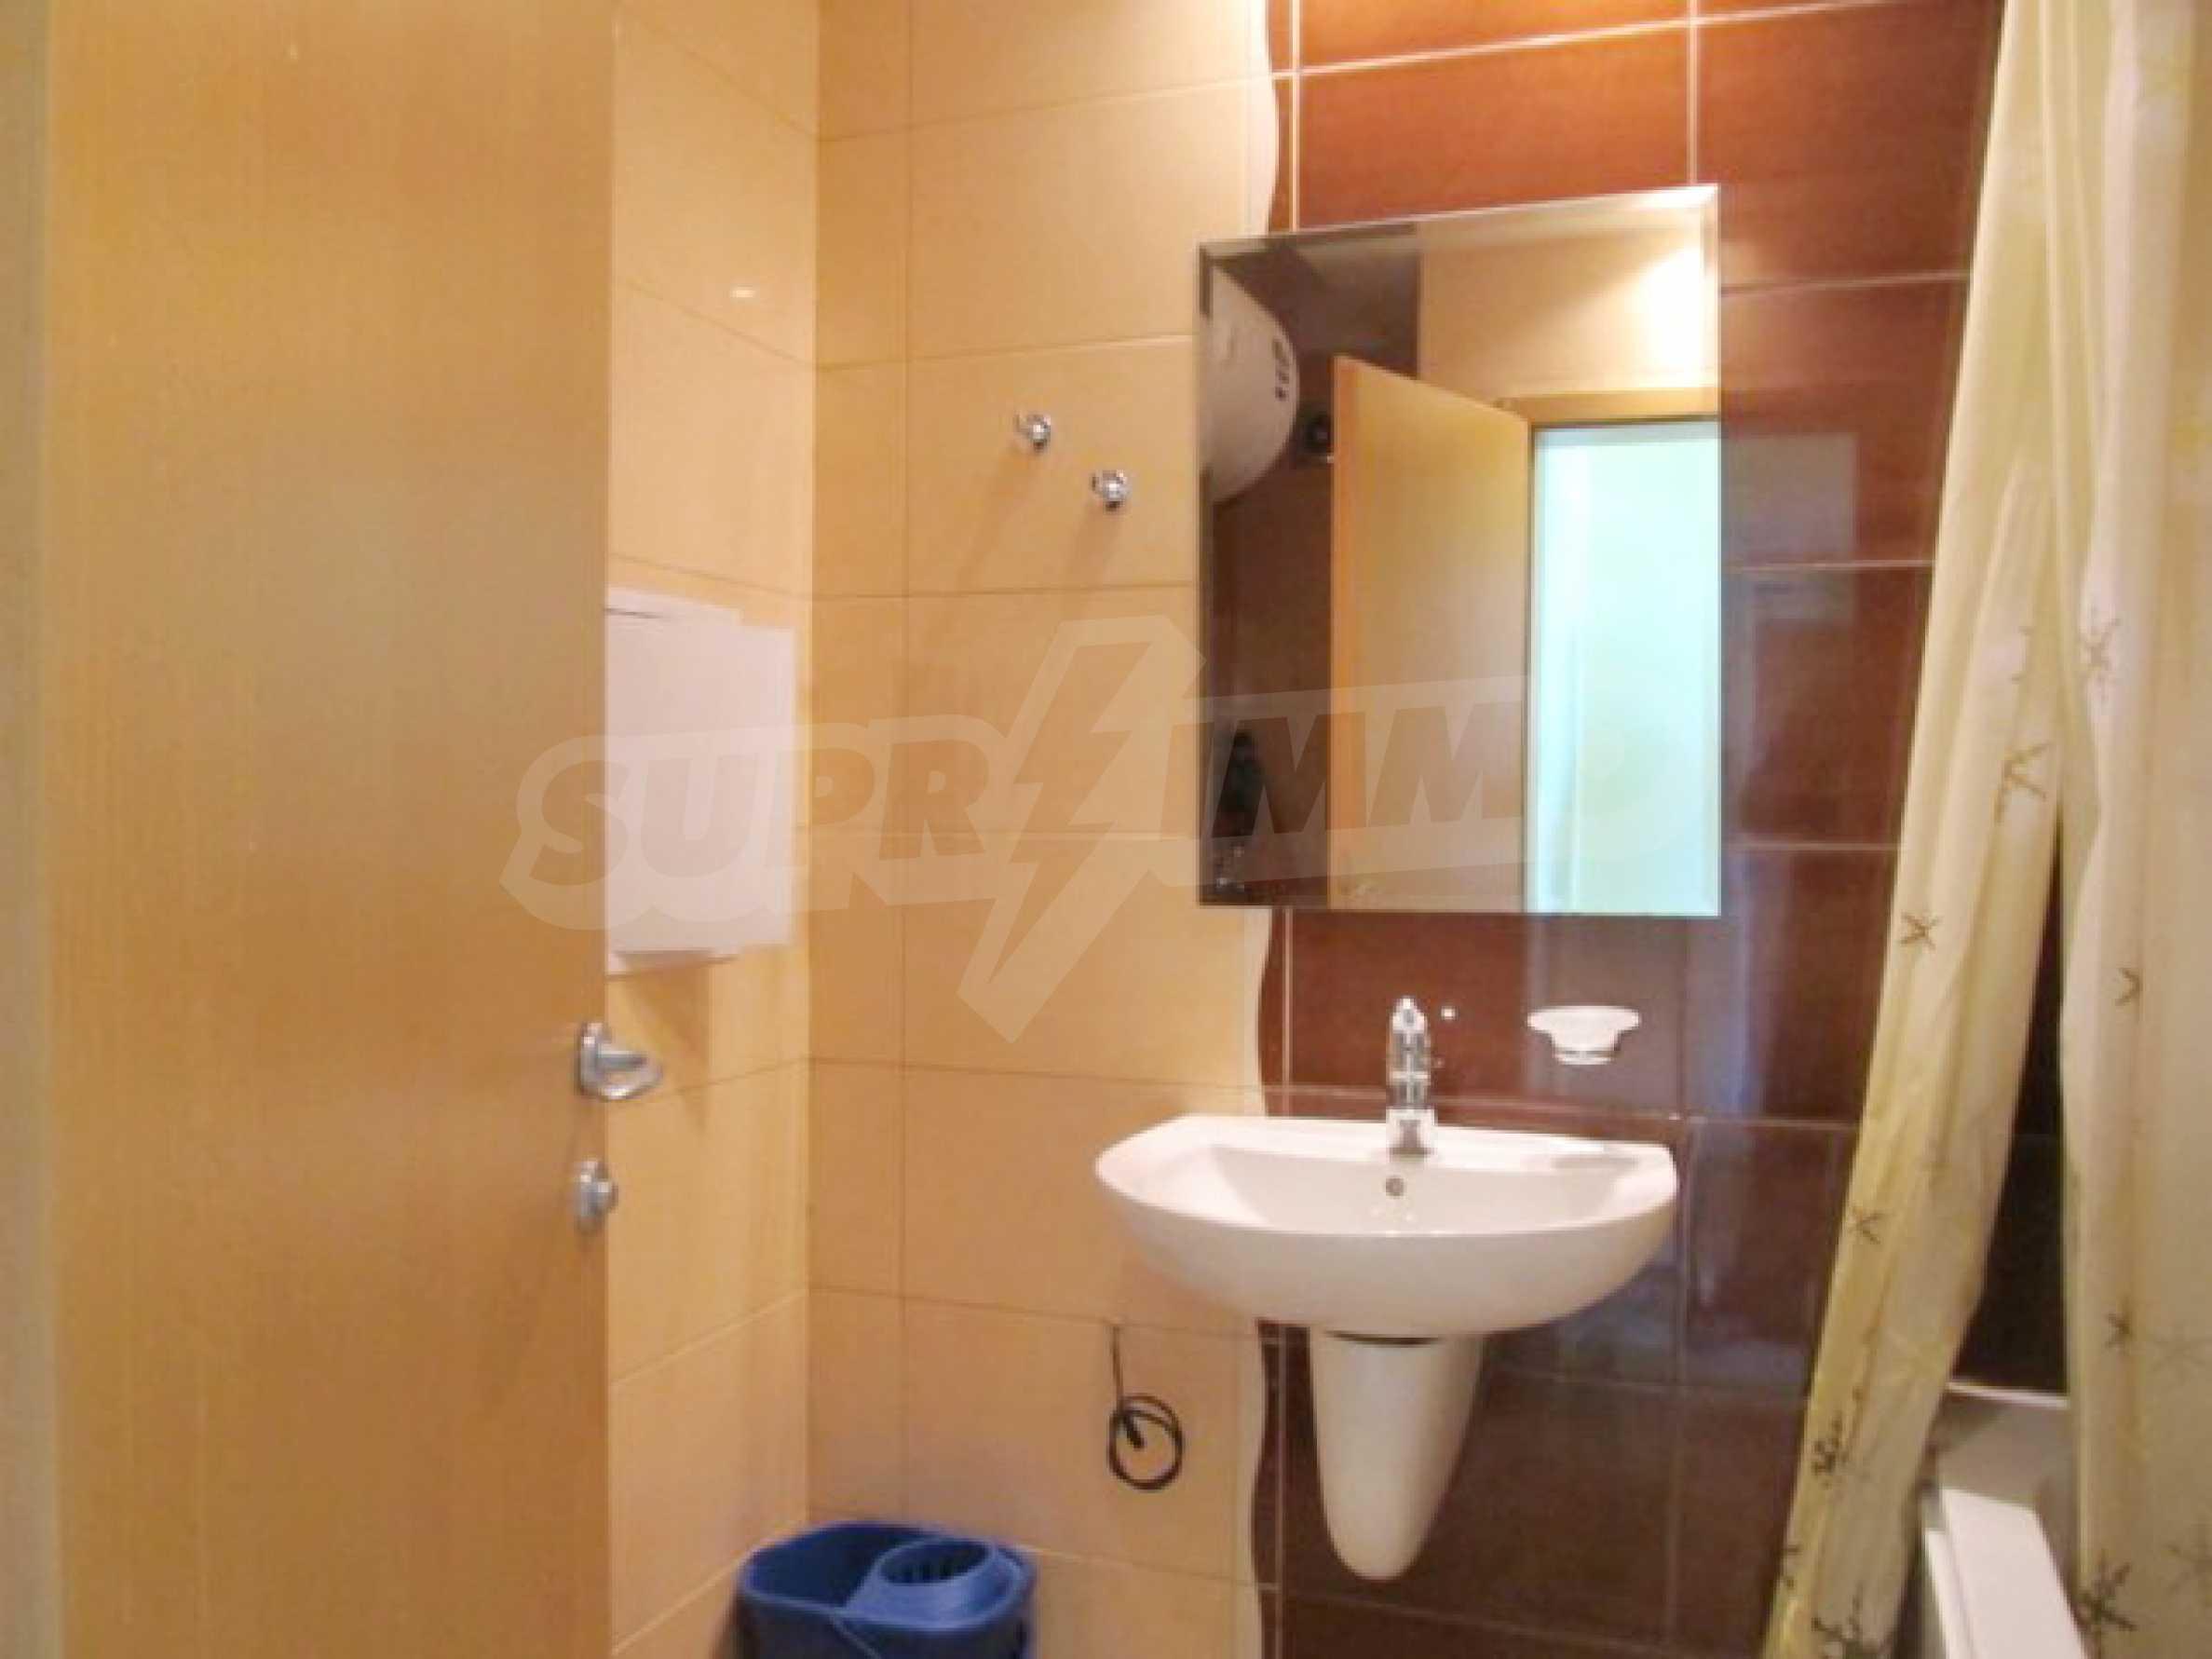 Тристаен апартамент за продажба в Поморие 20